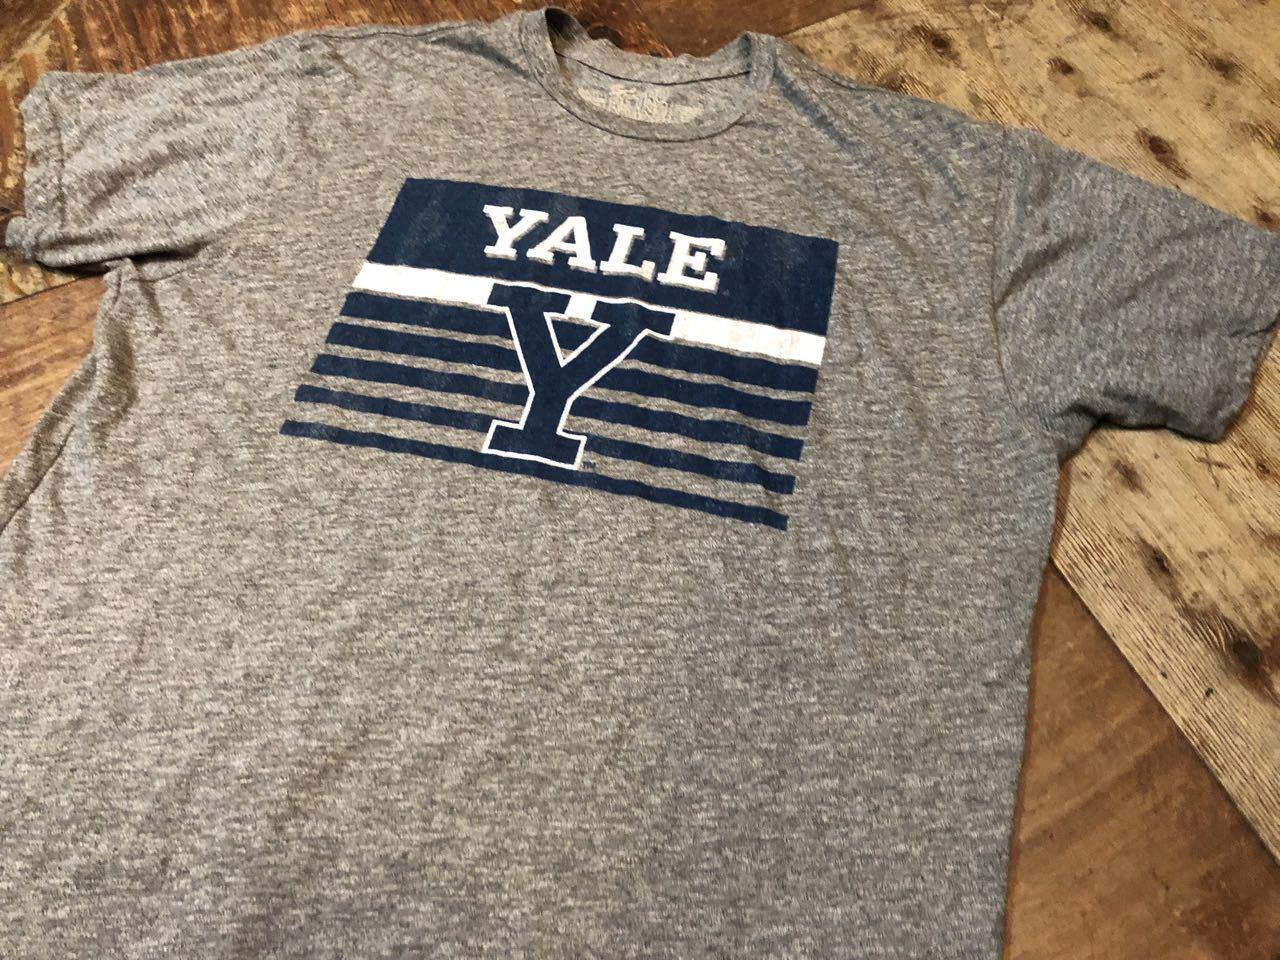 6月10日(月)入荷! MADE IN U.S.A YALE大学 Tシャツ!_c0144020_14453910.jpg